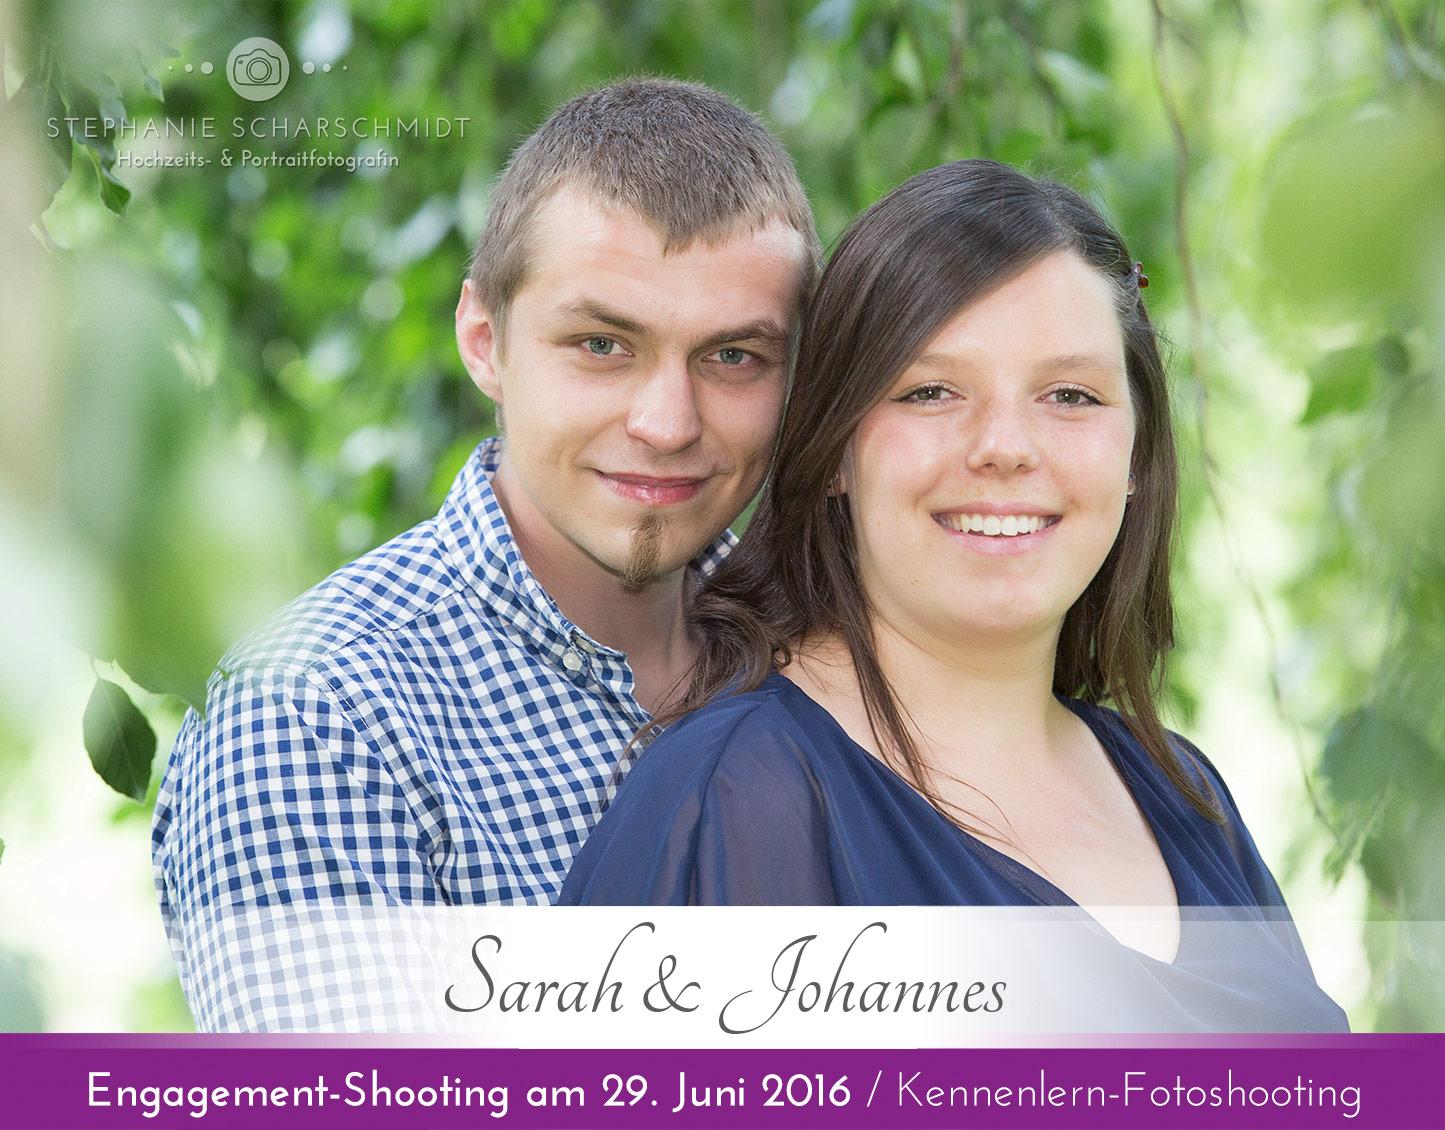 00 Engagement Fotoshooting in Greiz – Fotografin Stephanie Scharschmidt